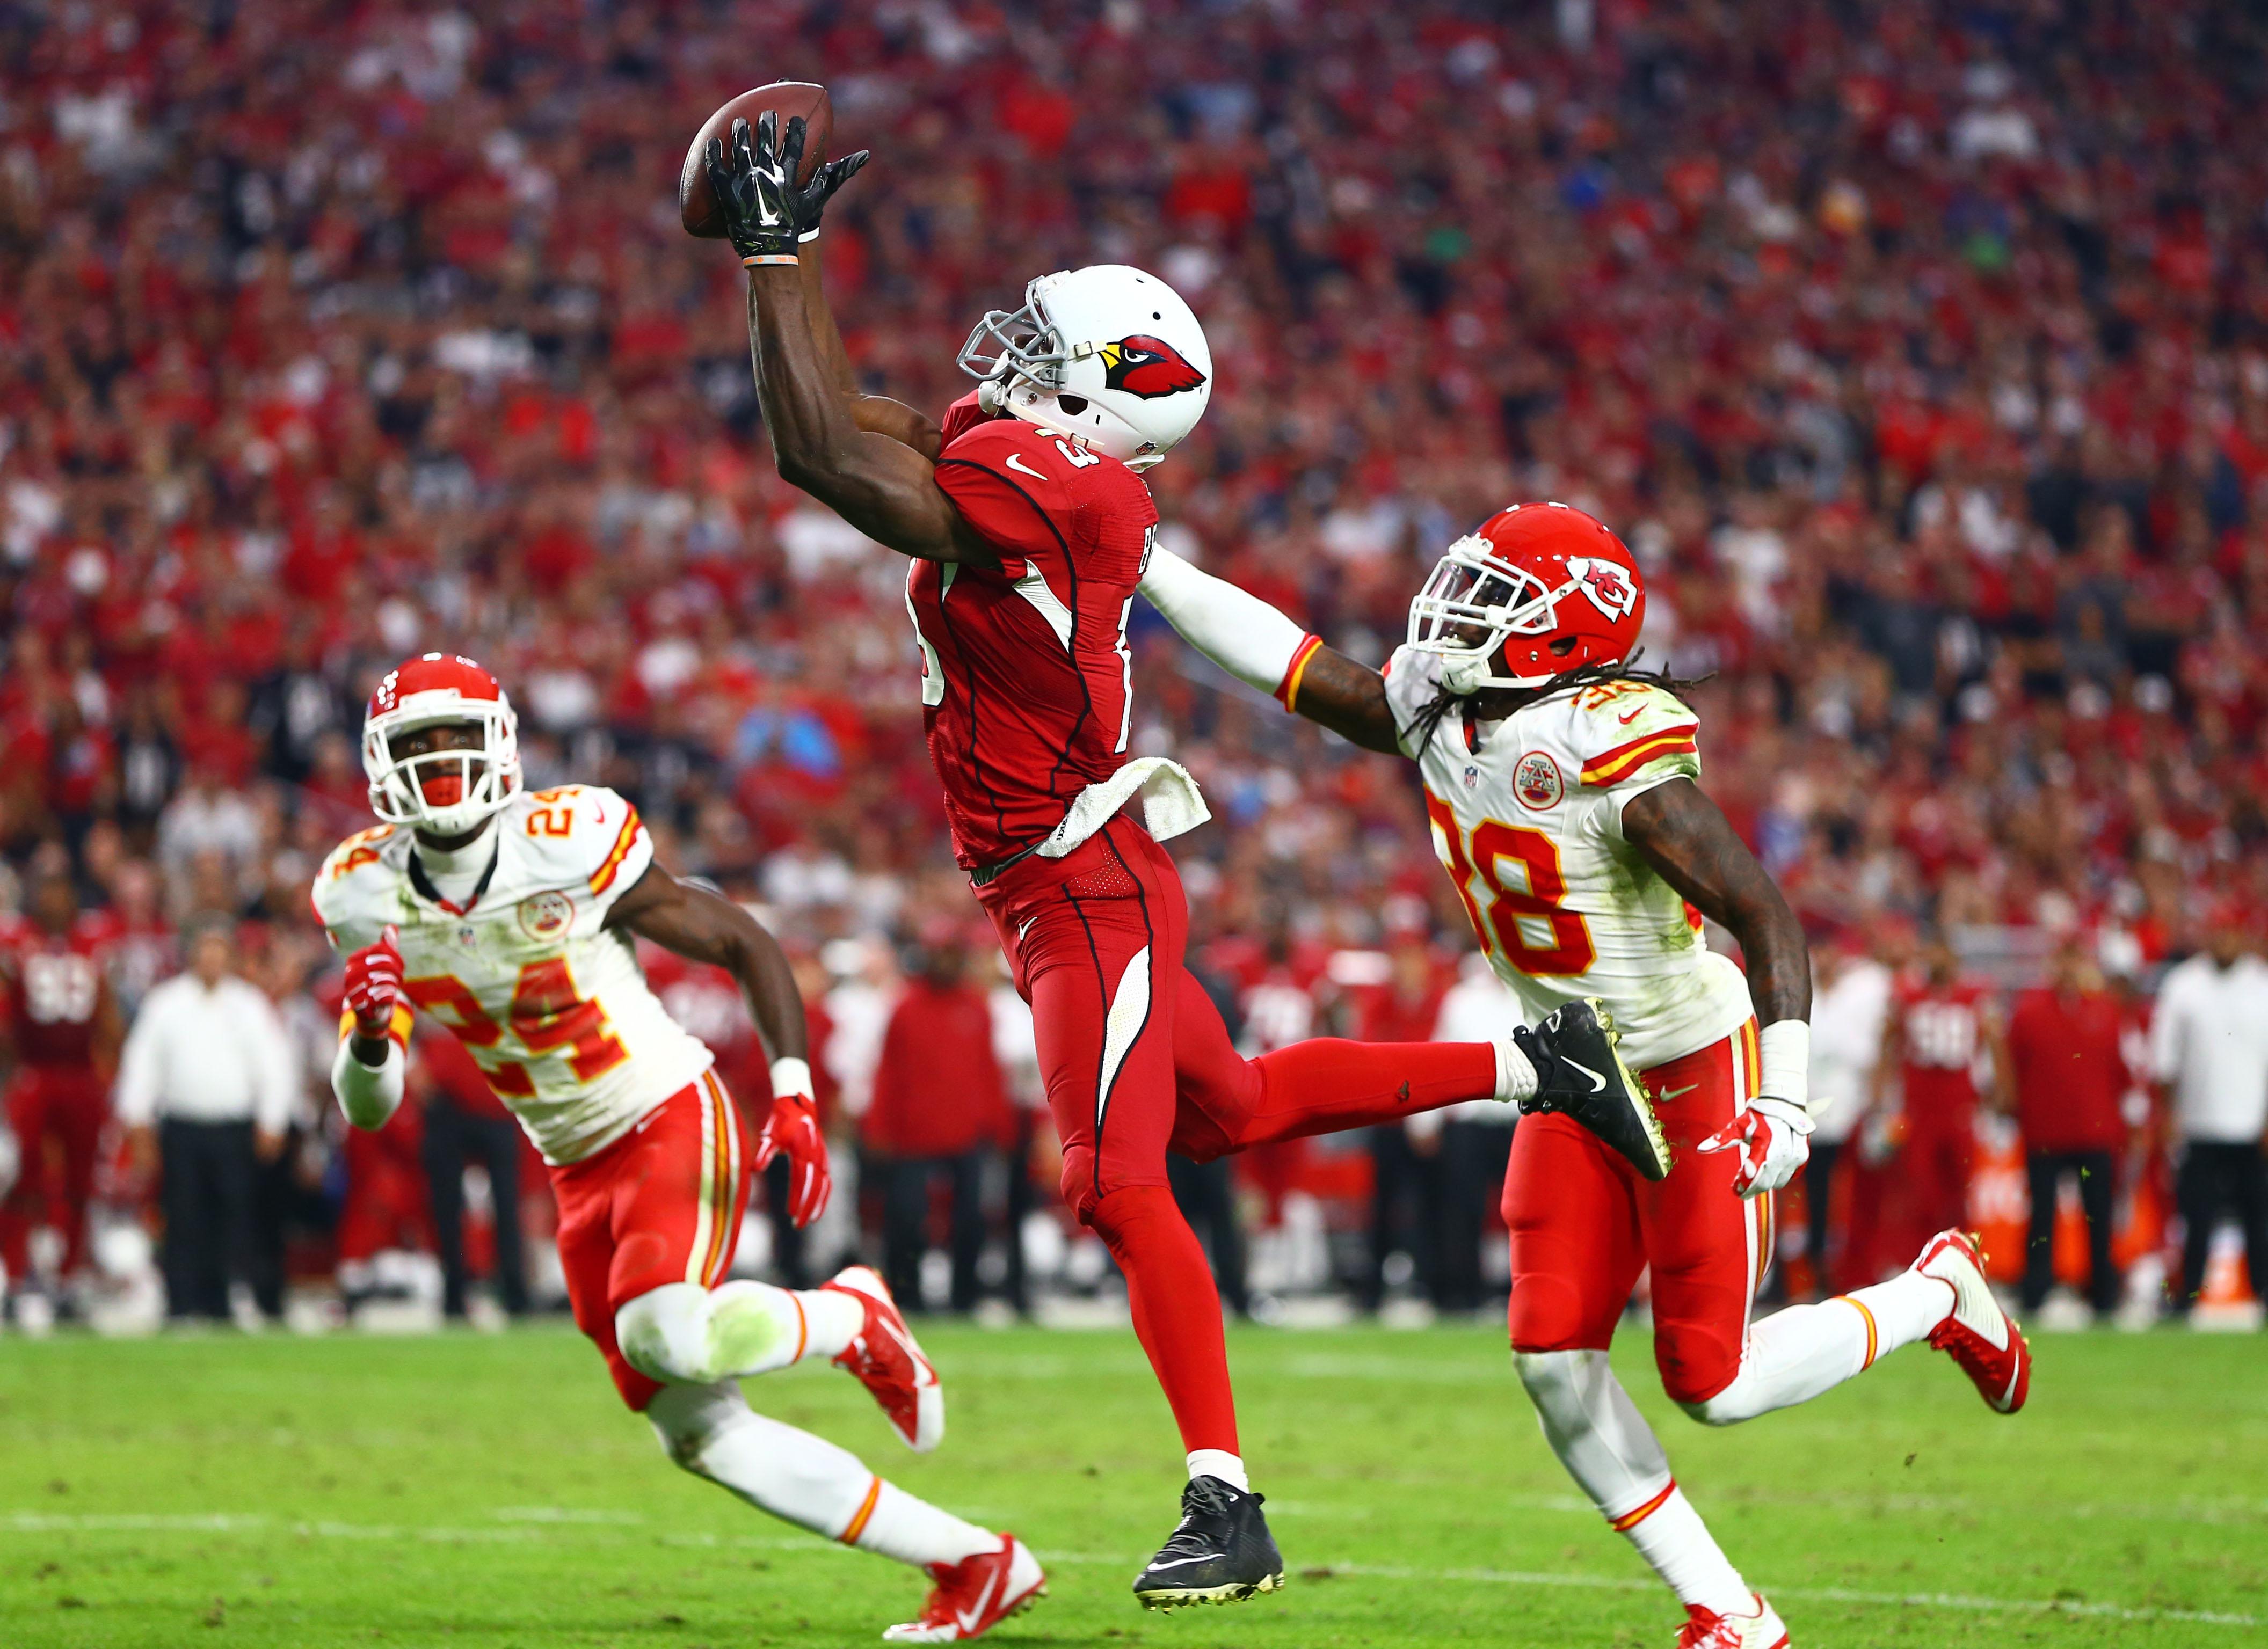 Cheap NFL Jerseys Online - Cardinals vs. Chiefs final score: Arizona rallies to 17-14 win ...